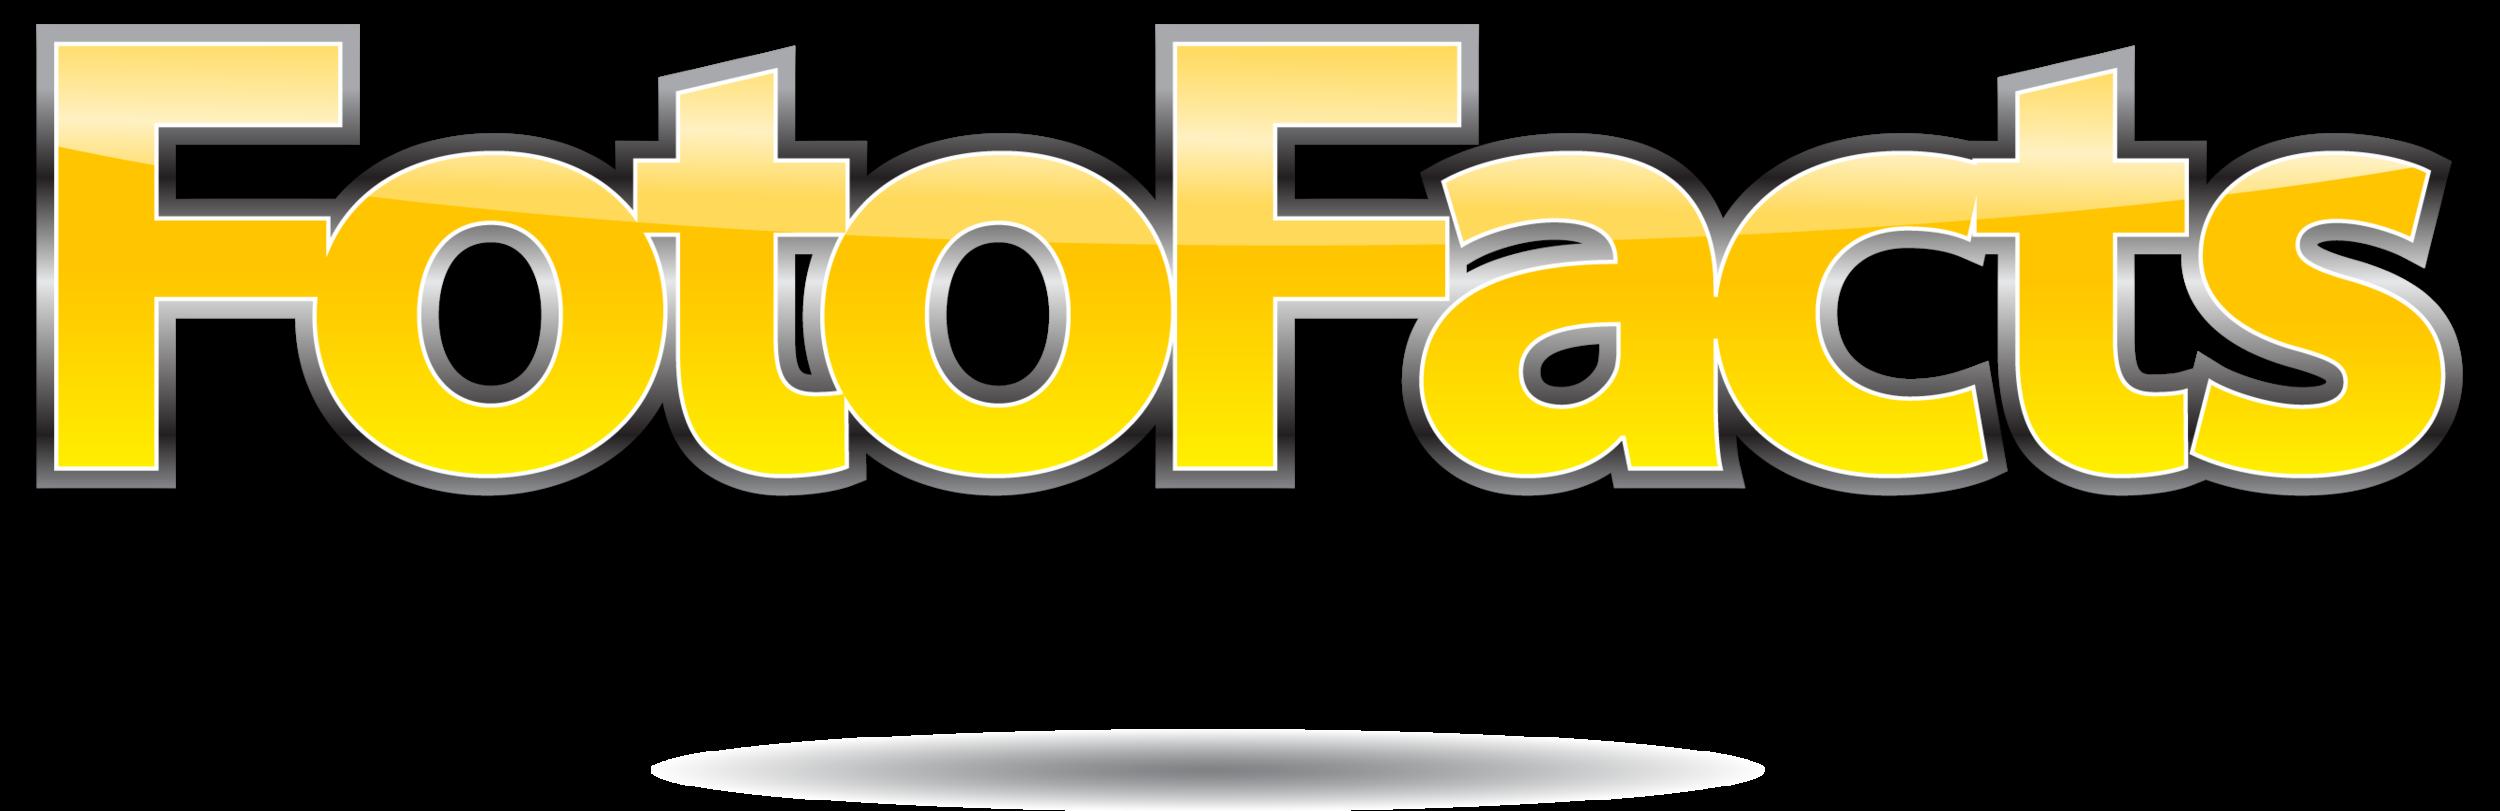 fotofactspodcast